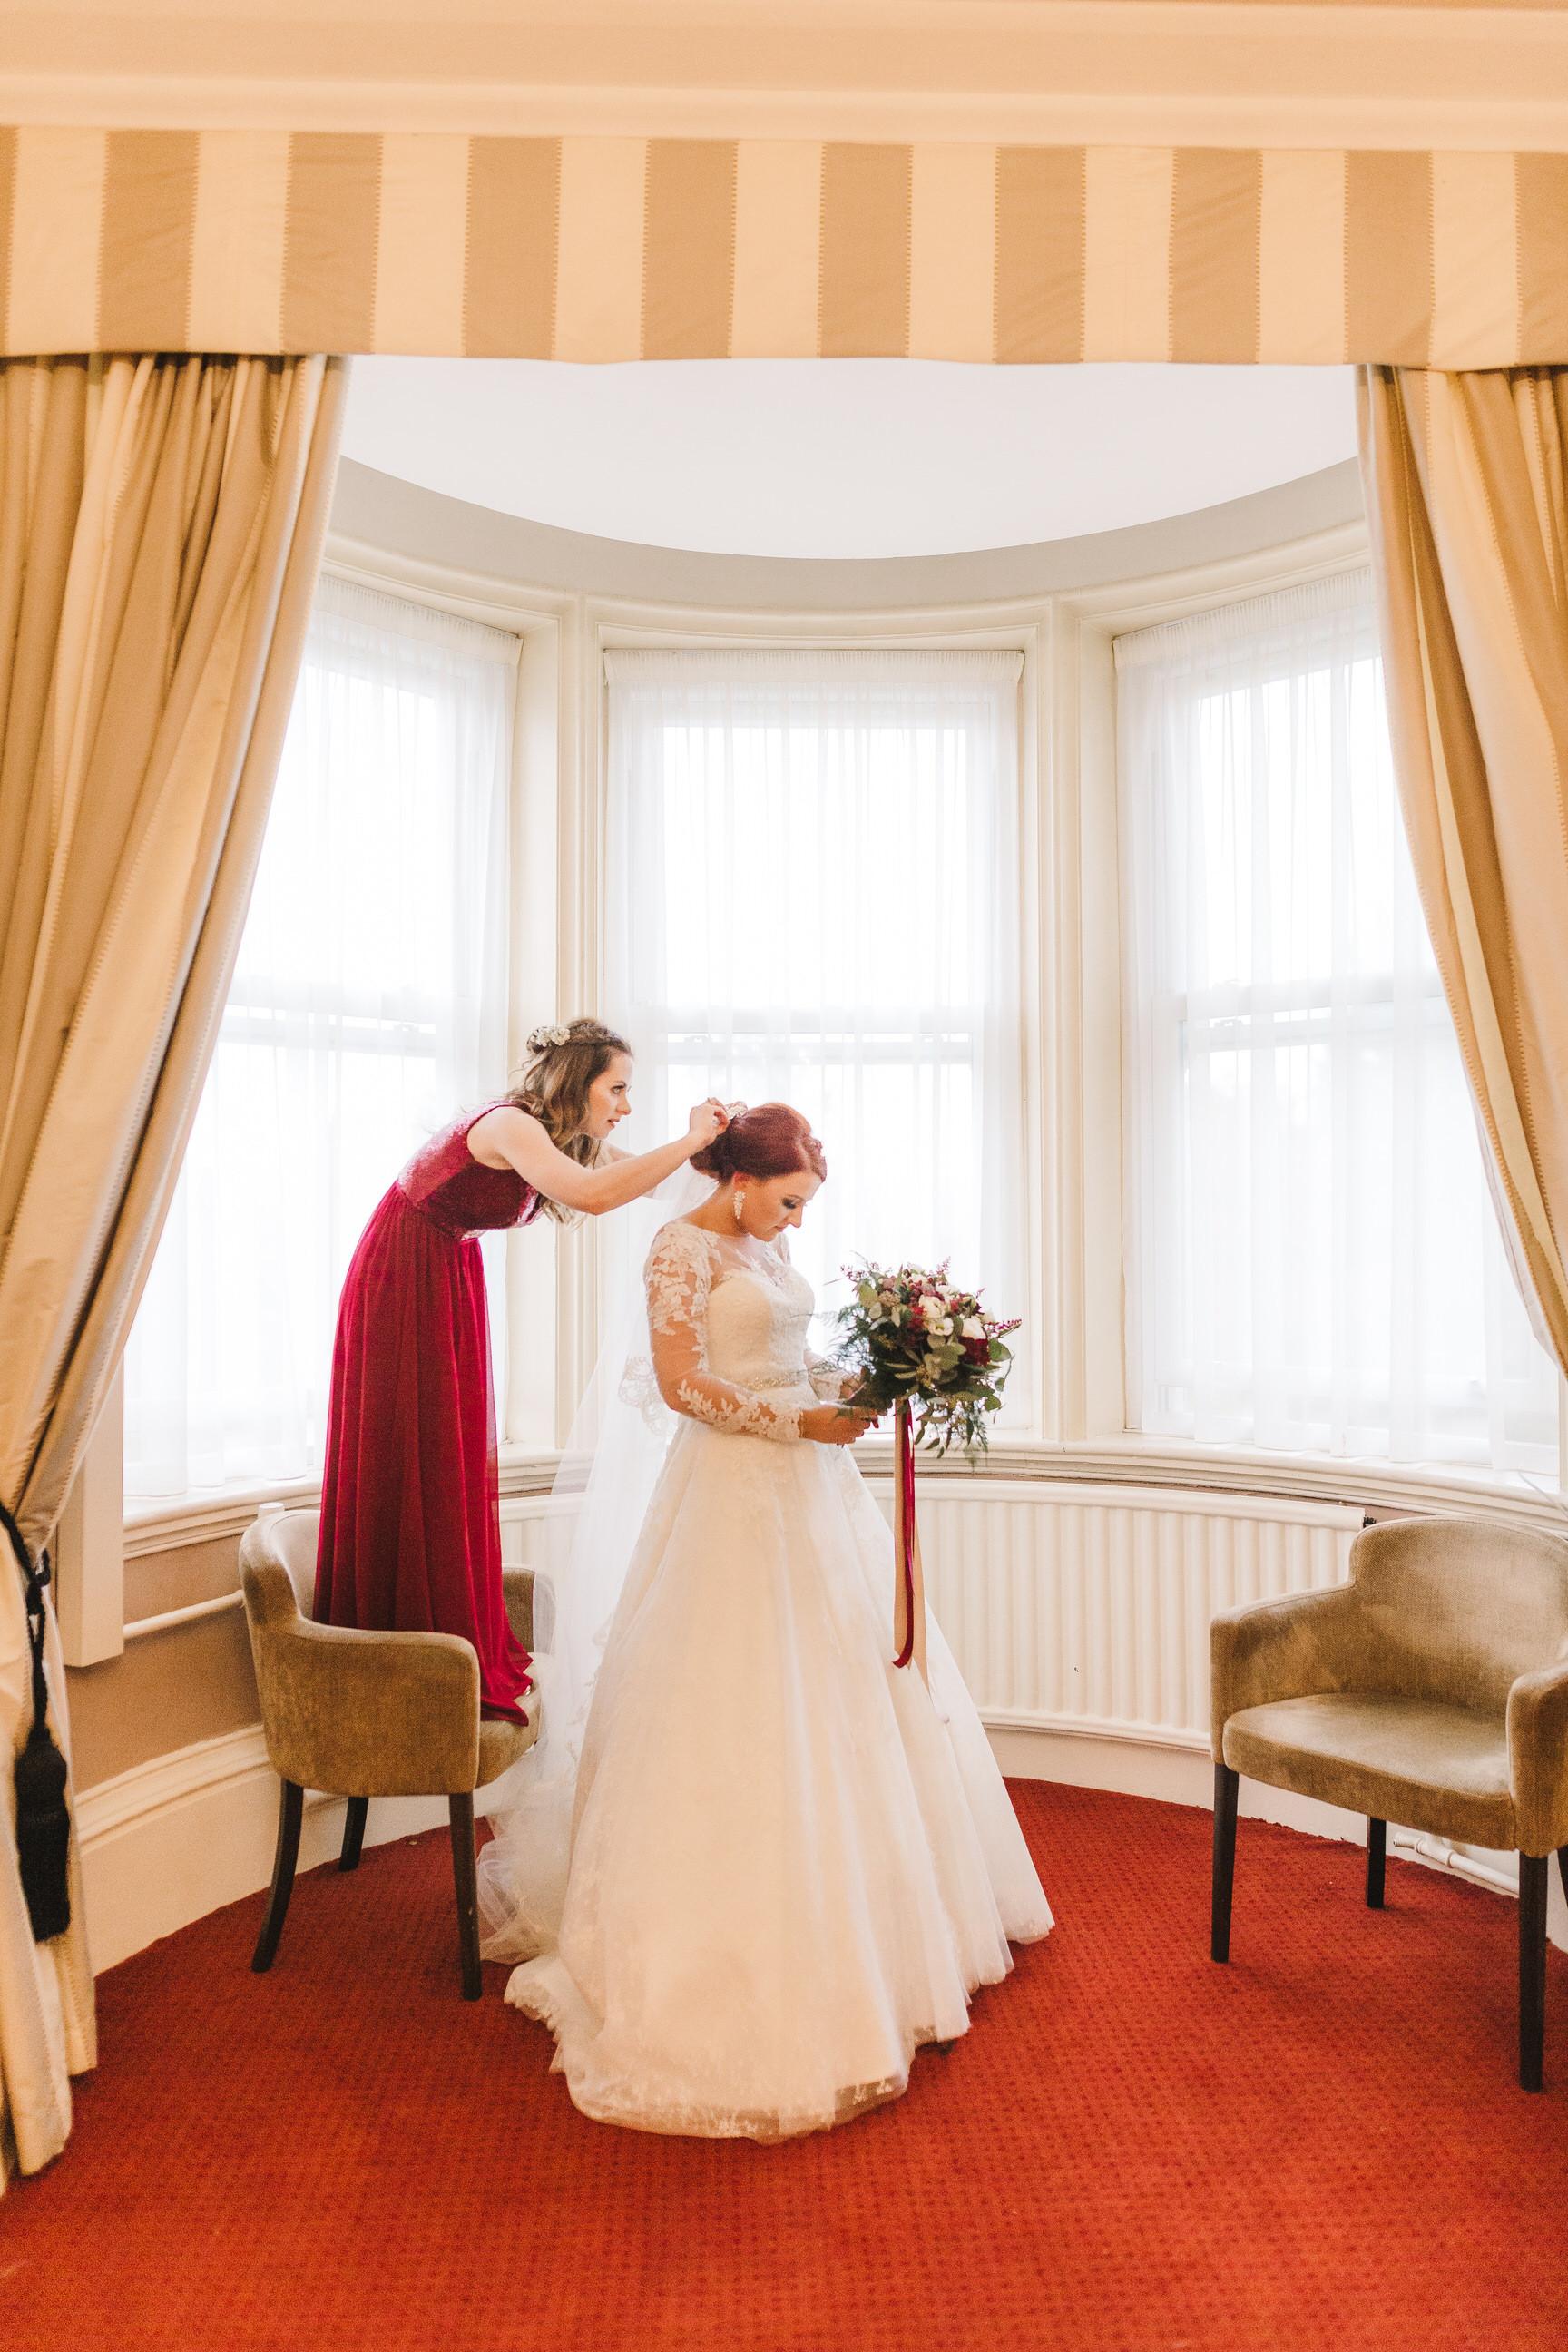 ilkley-west-yorkshire-wedding-111.jpg